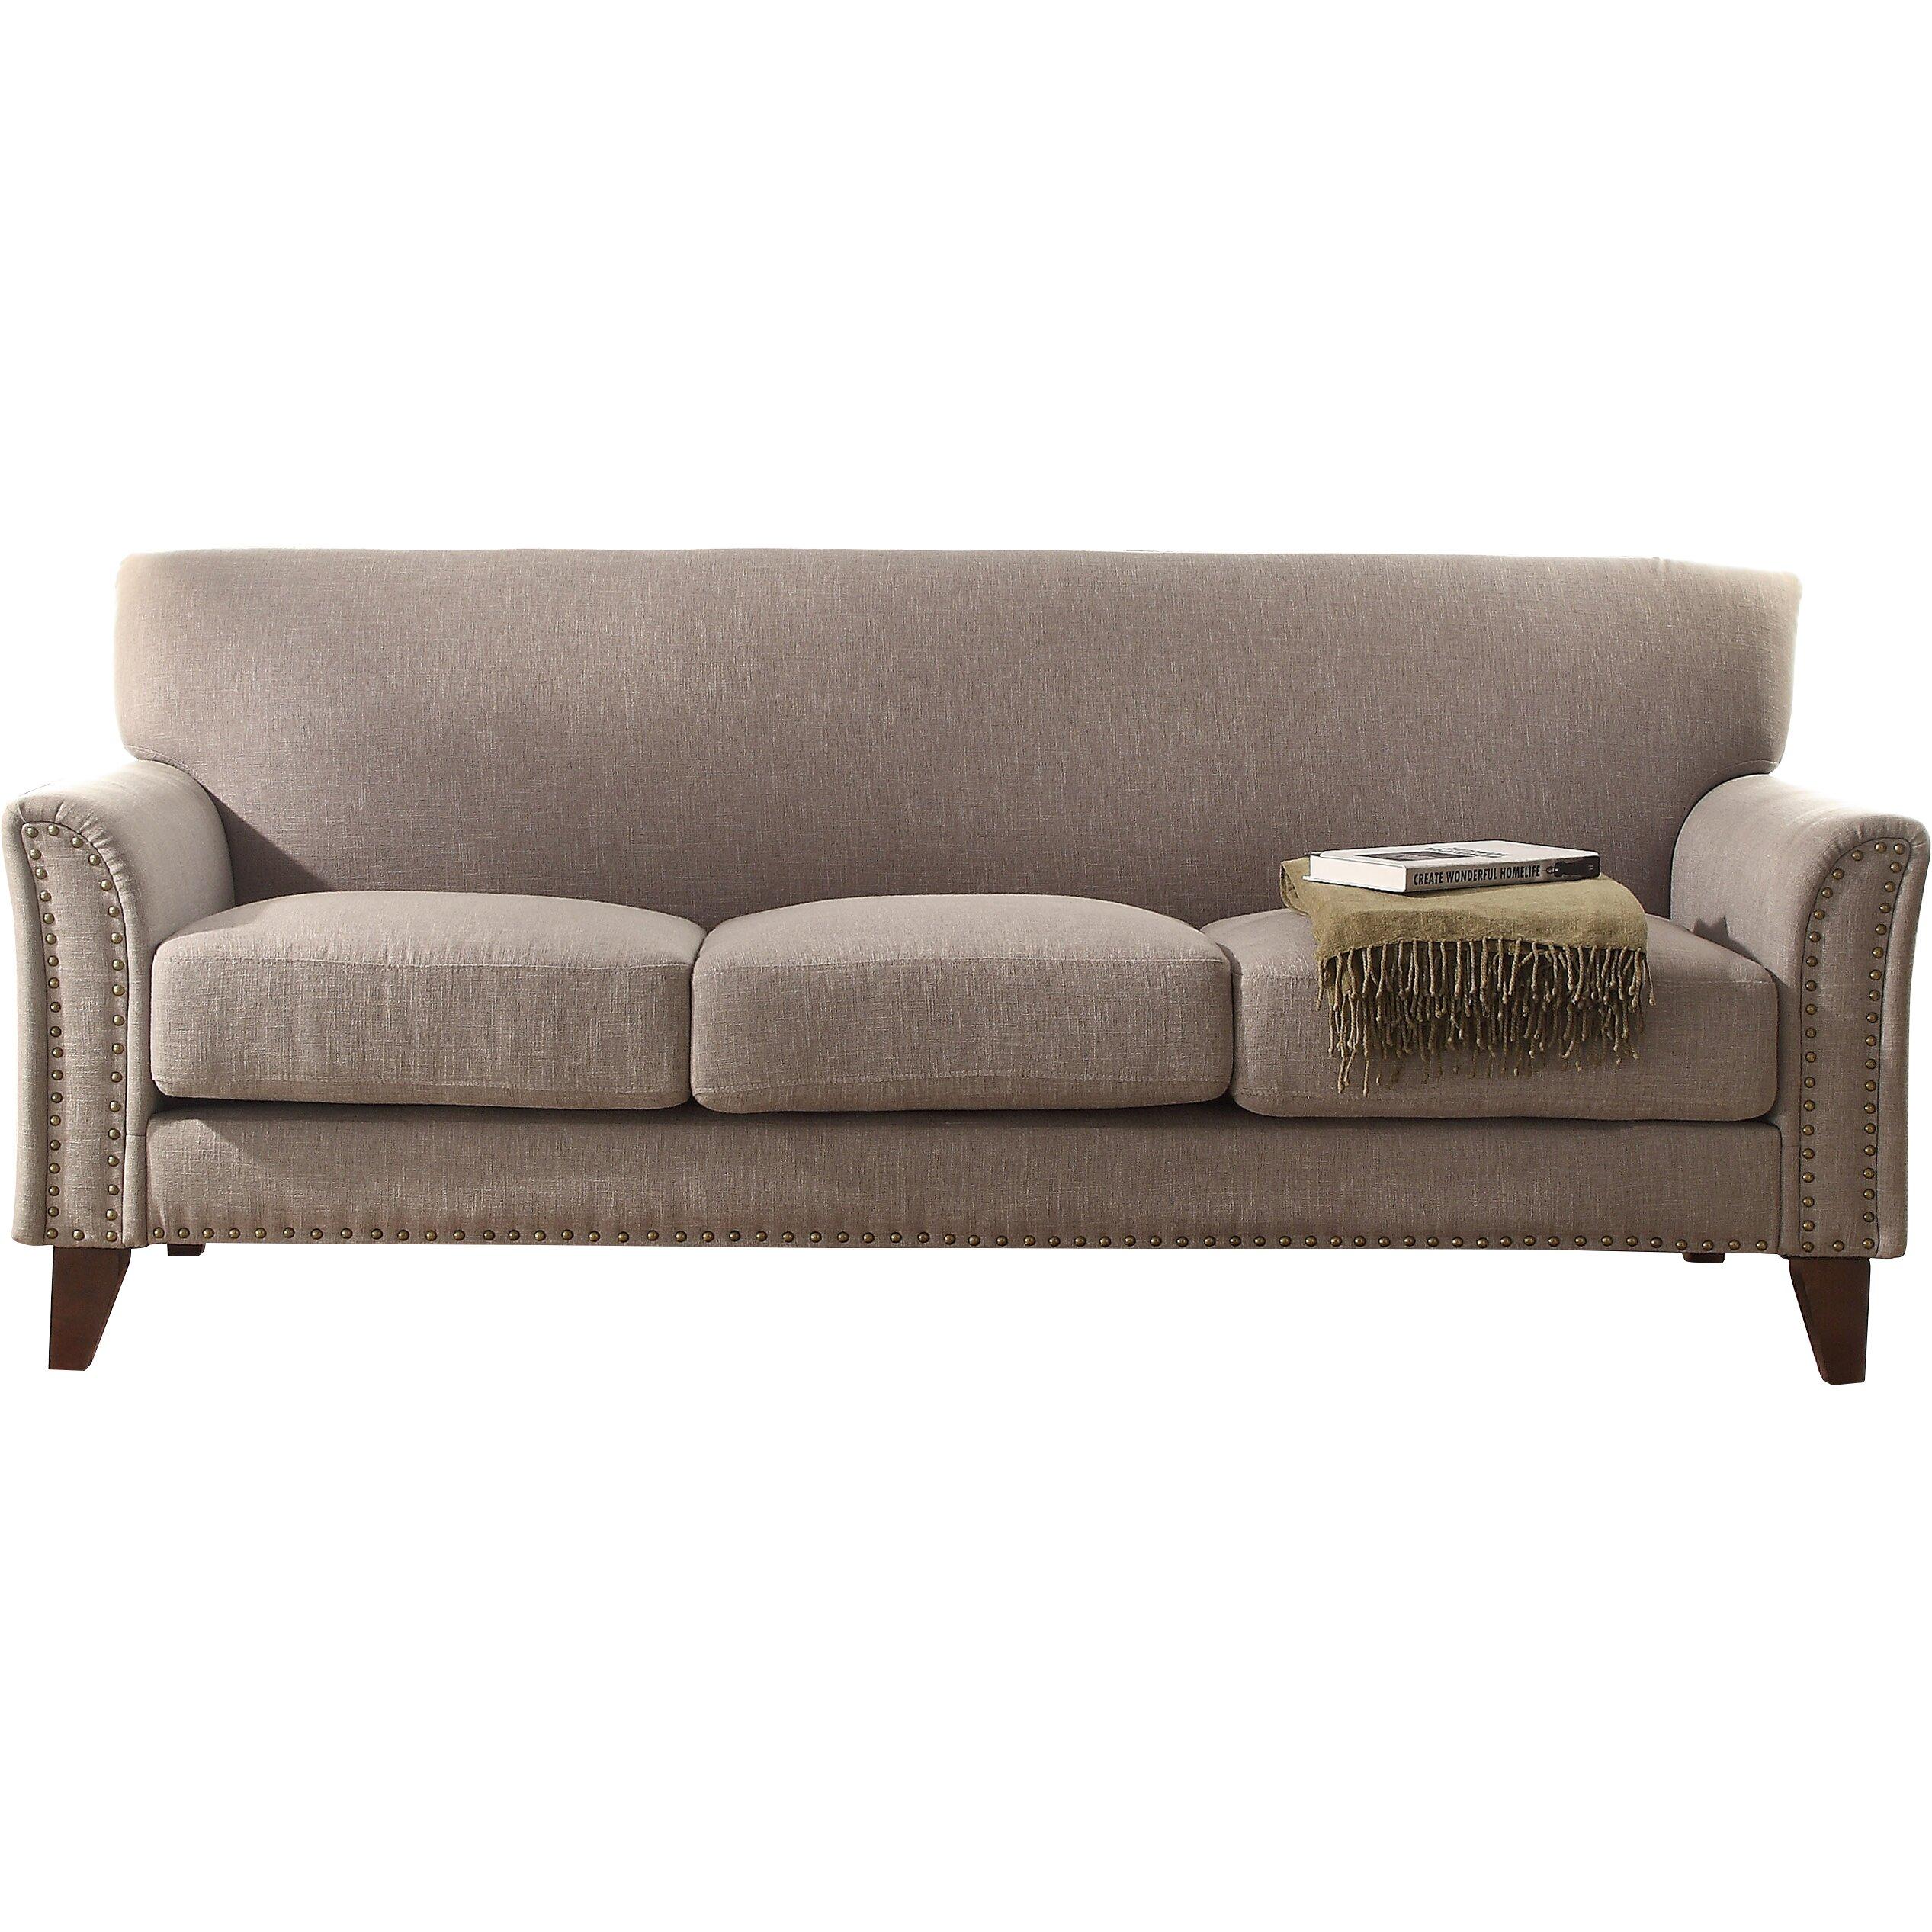 Laurel foundry modern farmhouse adoria sofa reviews - Laurel foundry modern farmhouse bedroom ...